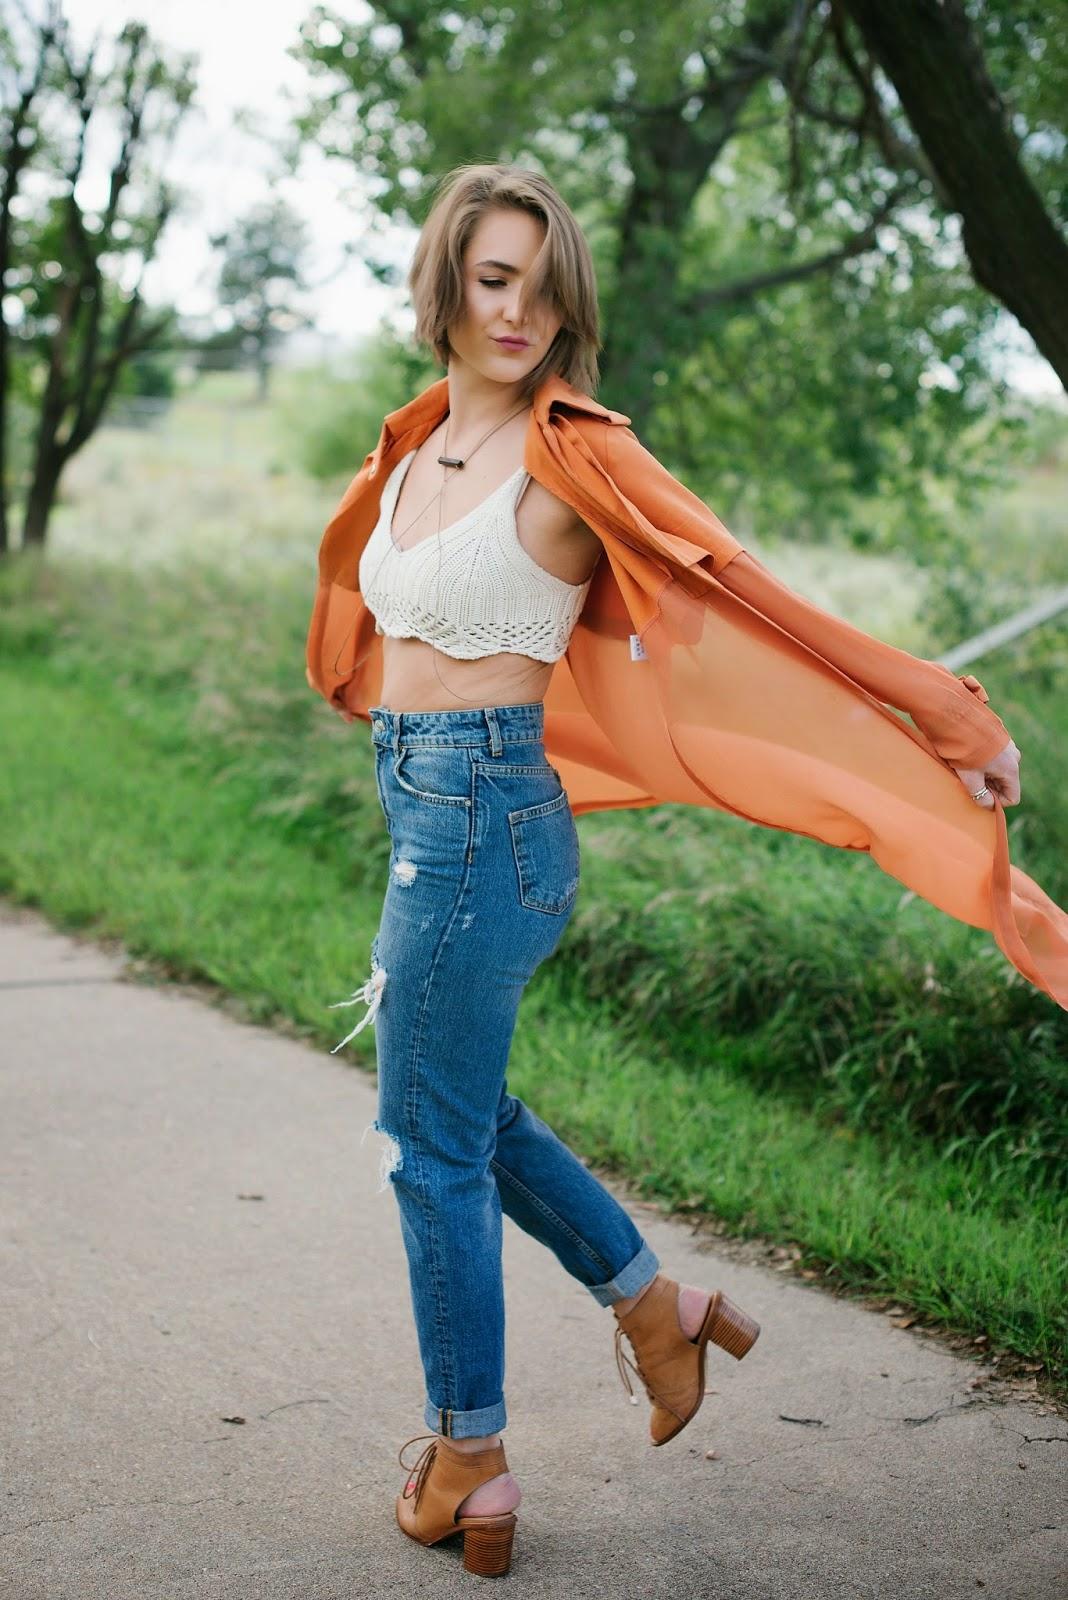 High waist jeans + kimono + crop | In good faith, Tess